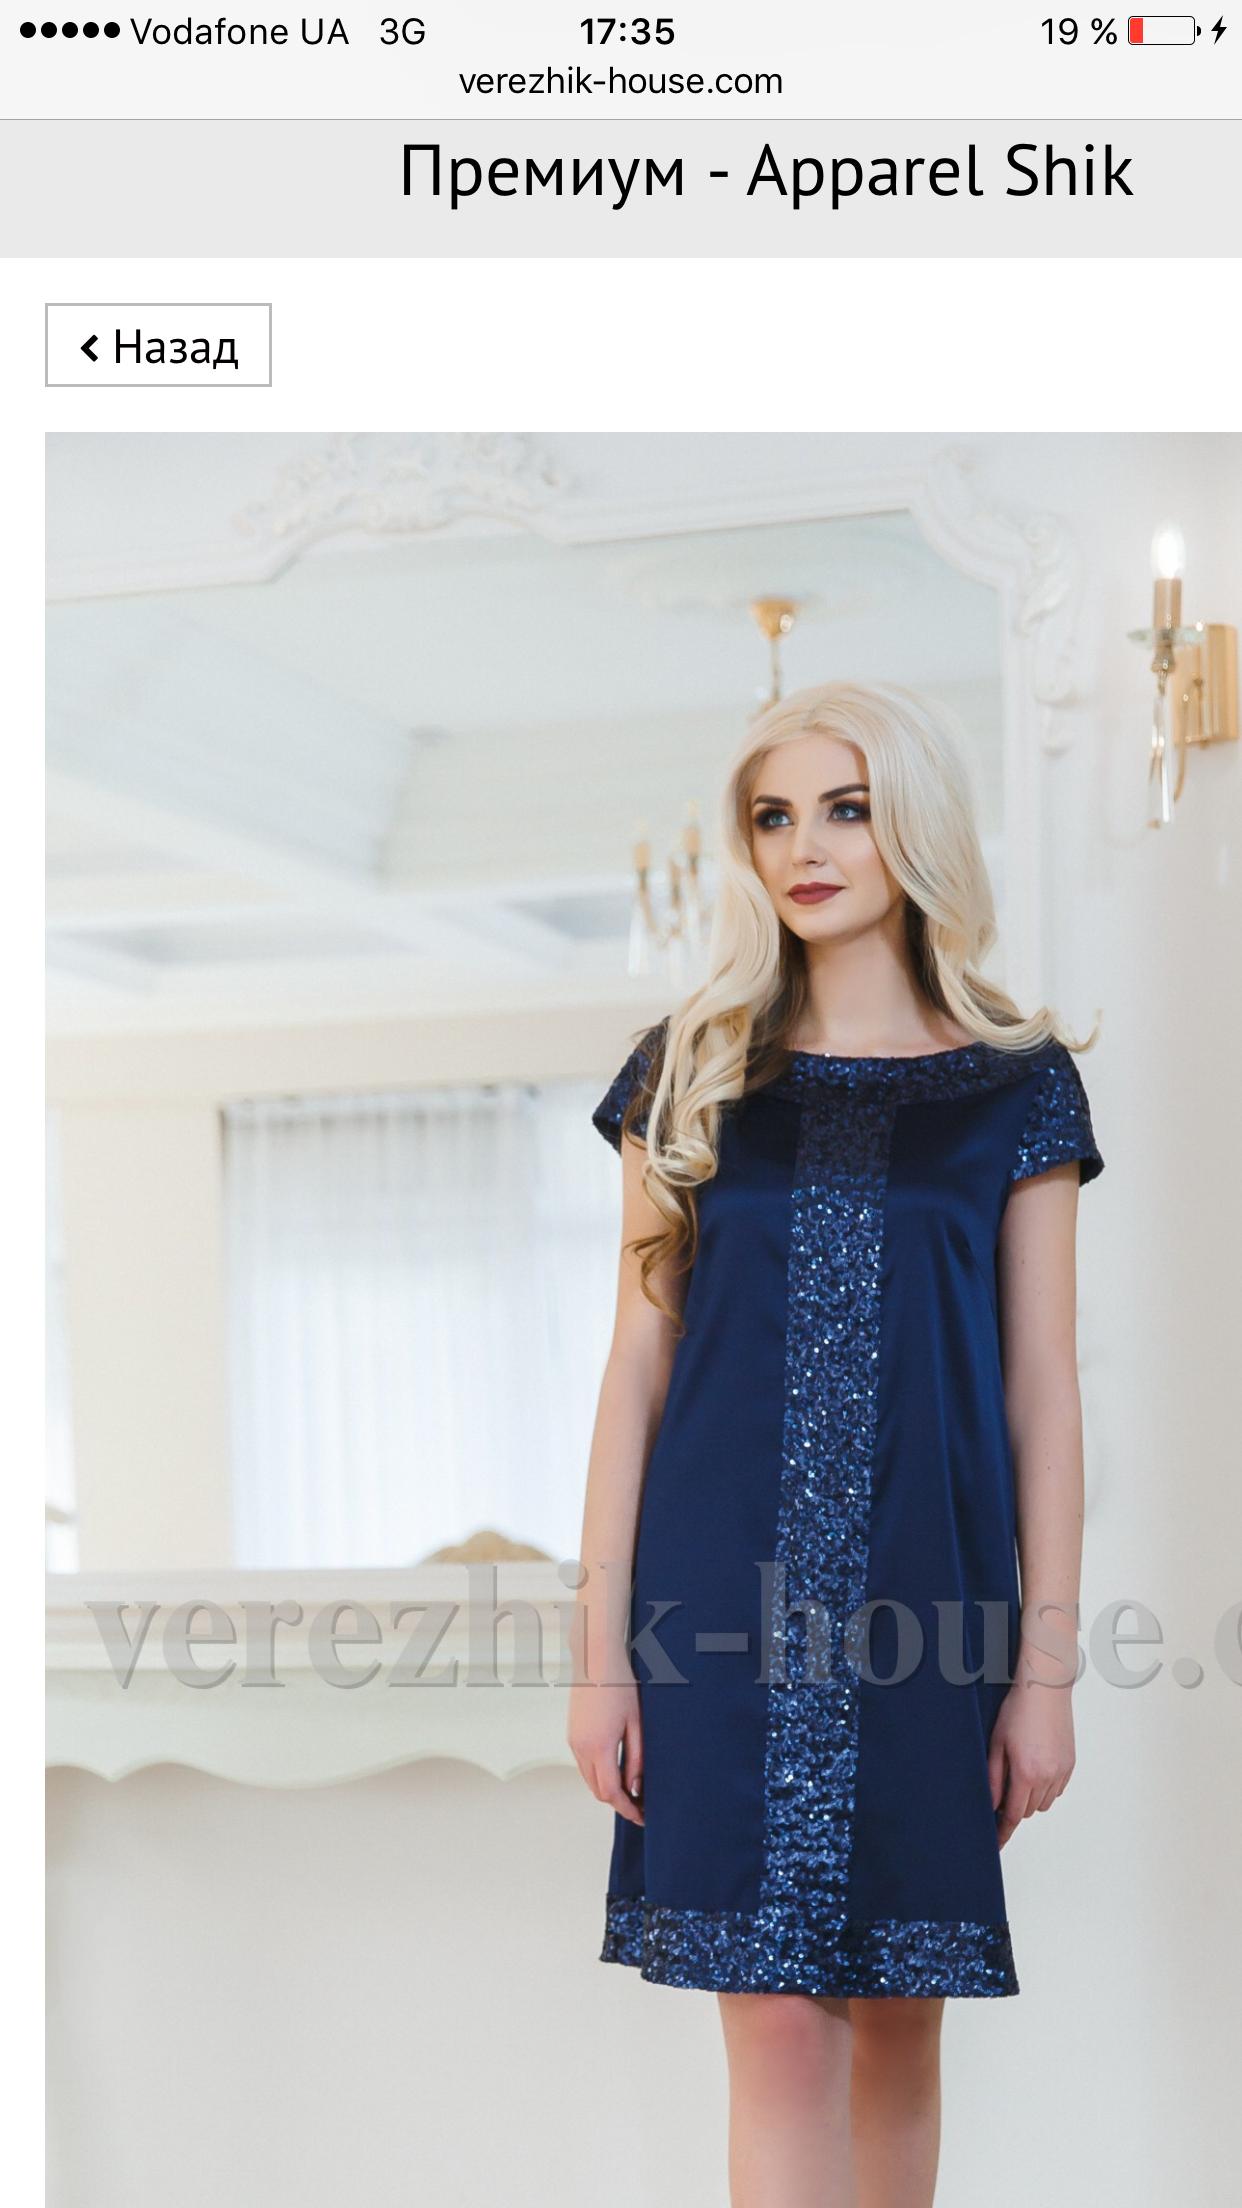 Formal dresses to wear to a wedding  Платье Новый год  Evening dresses  Pinterest